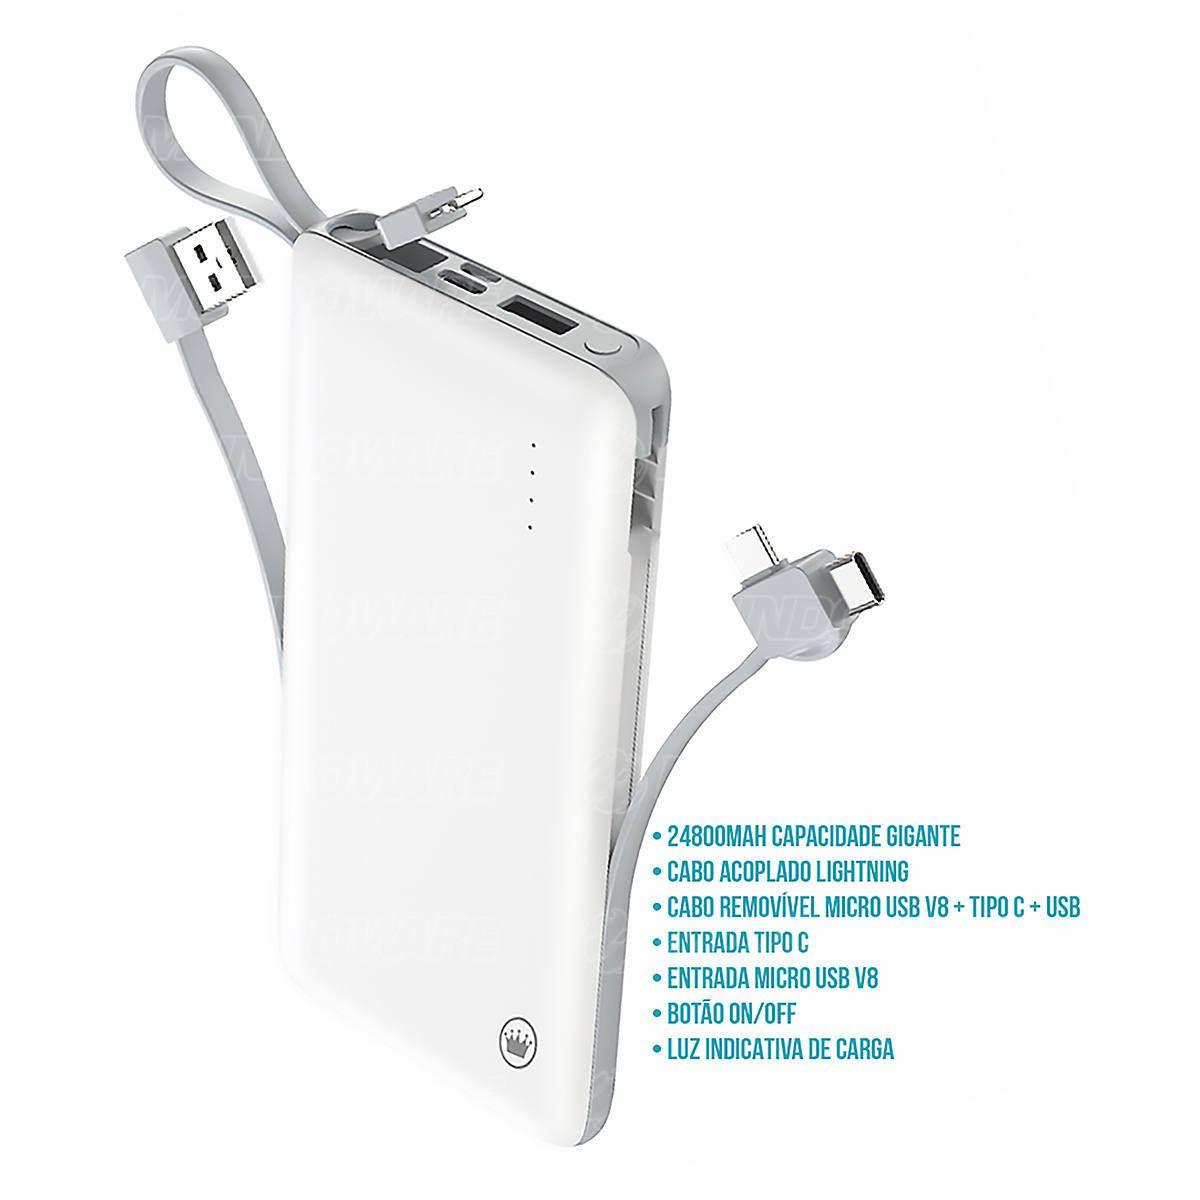 Power Bank 24800mAh Multi Portas Cabo Acoplado Lightning e Cabo Removível MicroUSB + Type-C + USB Kimaster PN959